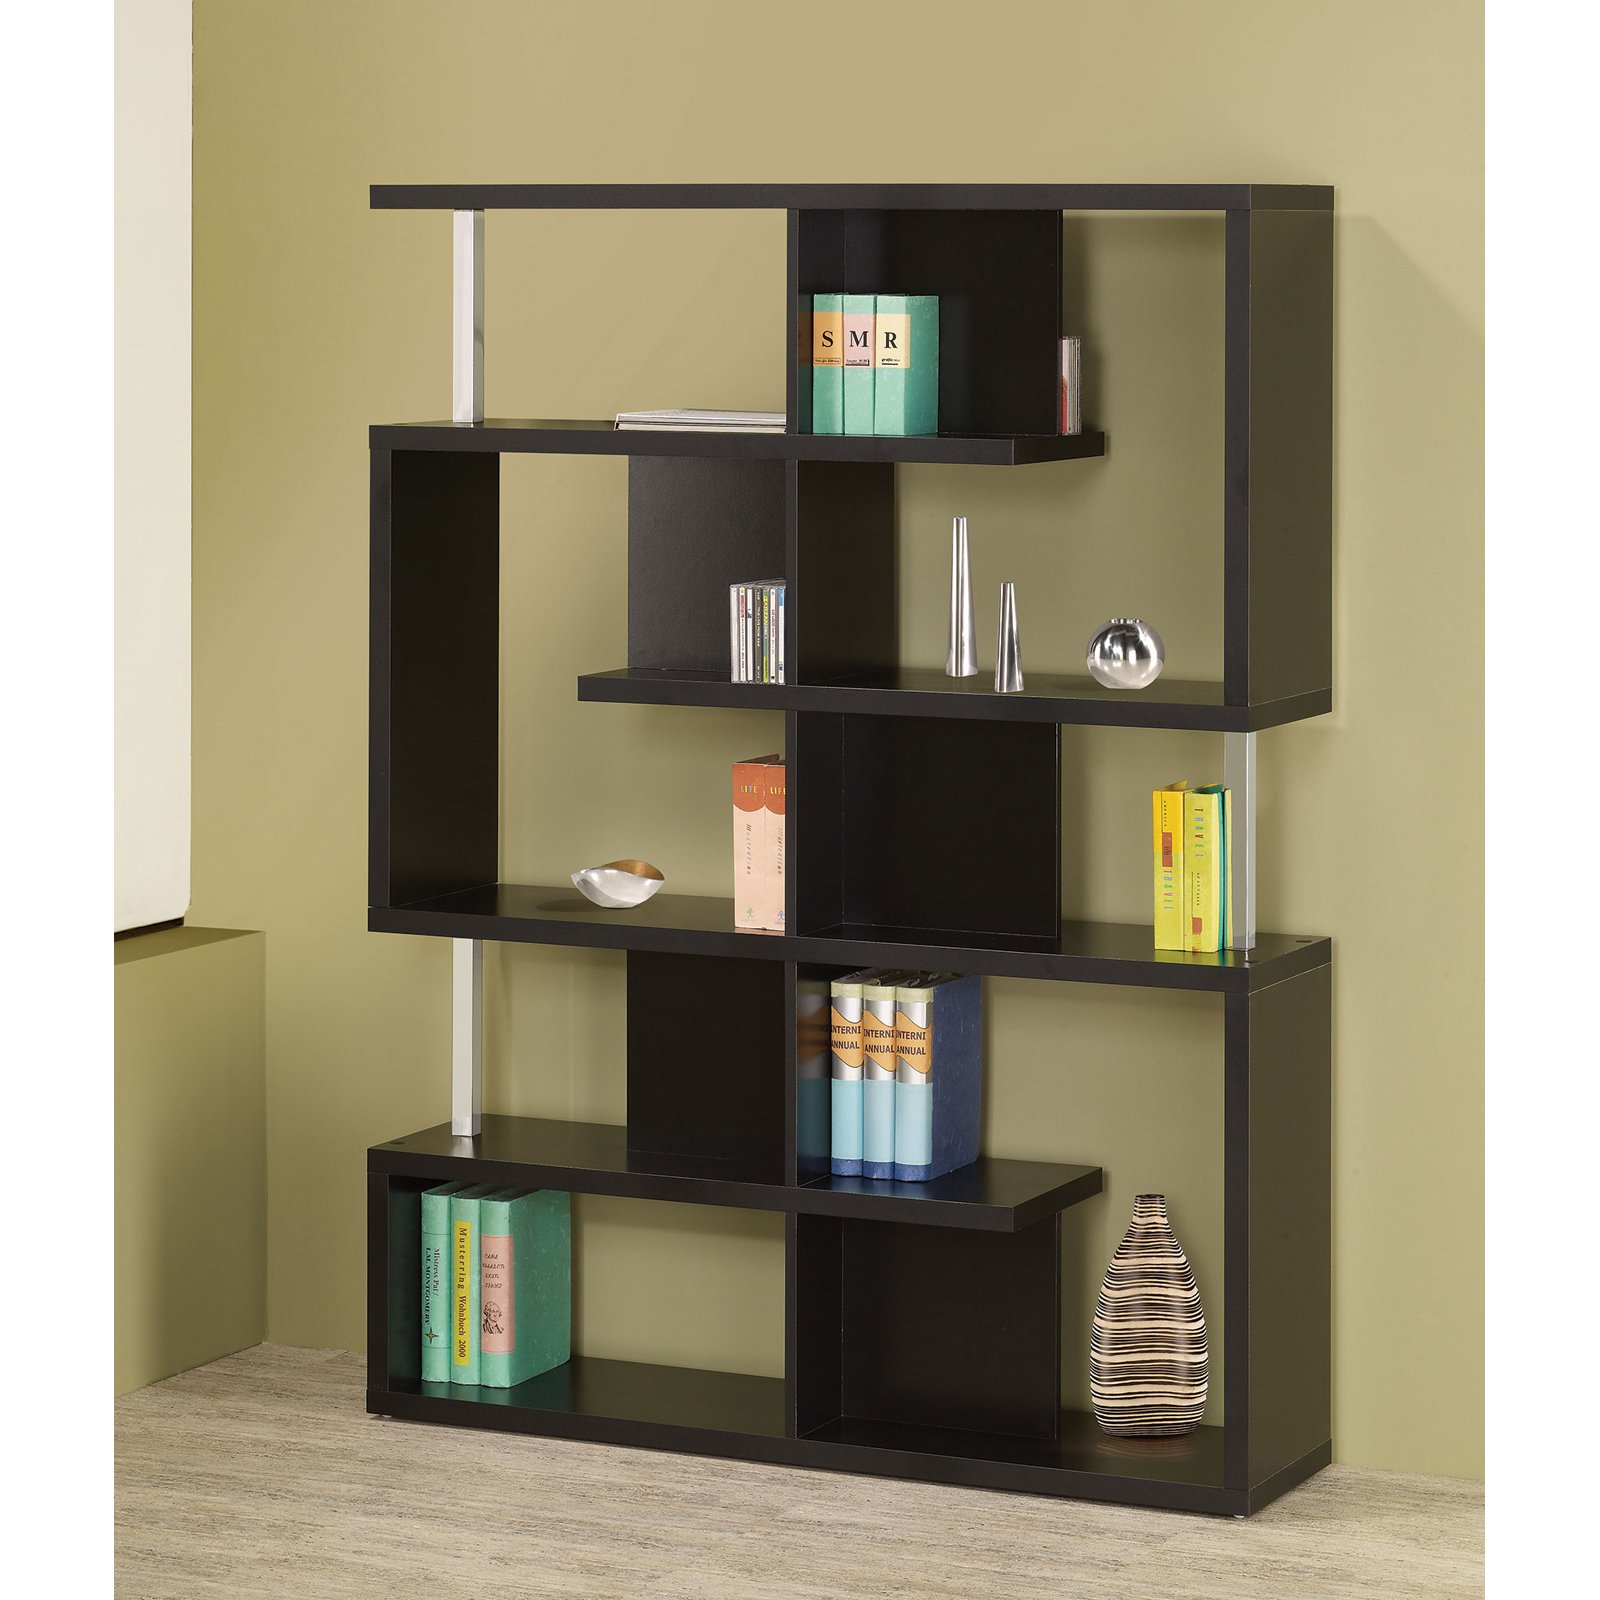 Coaster Company Bookcase, Black and Chrome